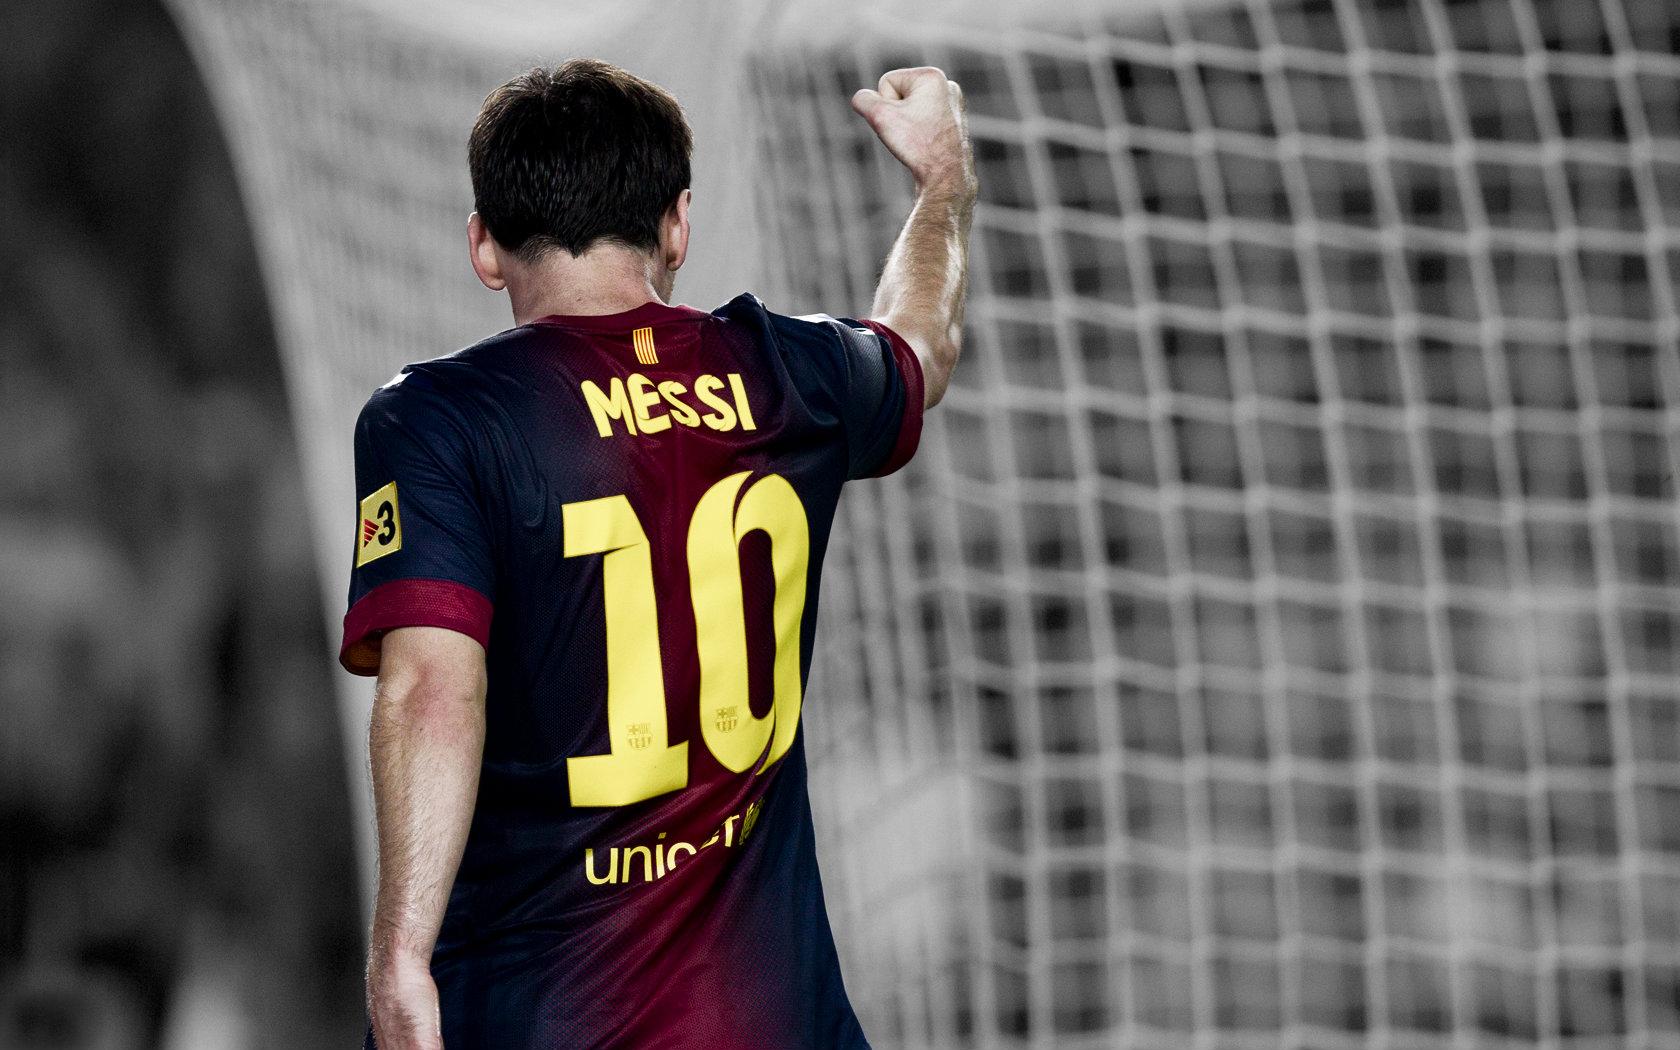 Soccer Lionel Messi HD Desktop Wallpapers Most HD Wallpapers 1680x1050